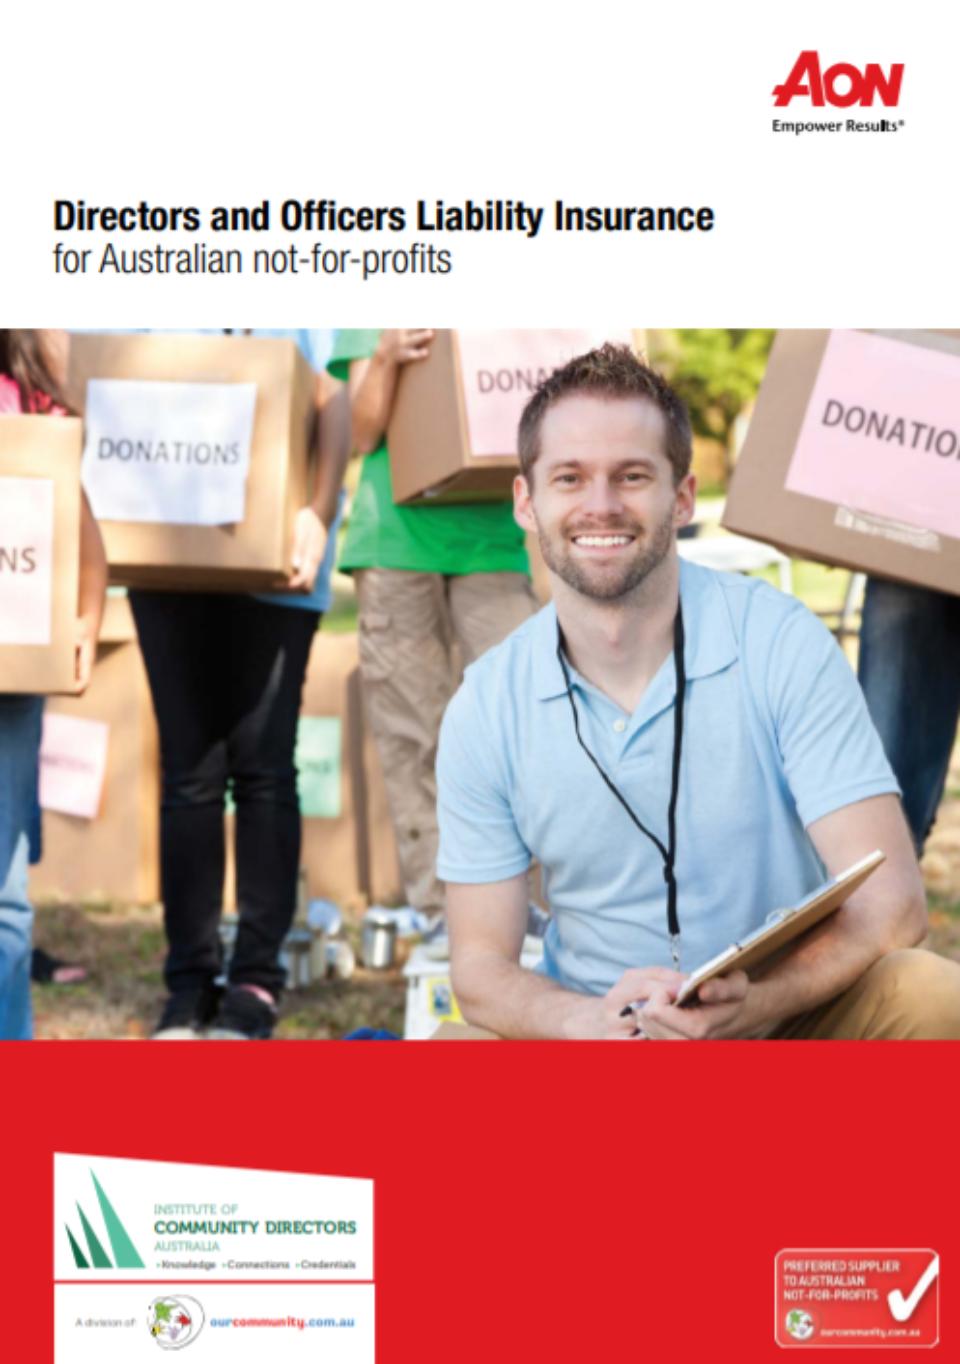 Aon directorsinsurance cover